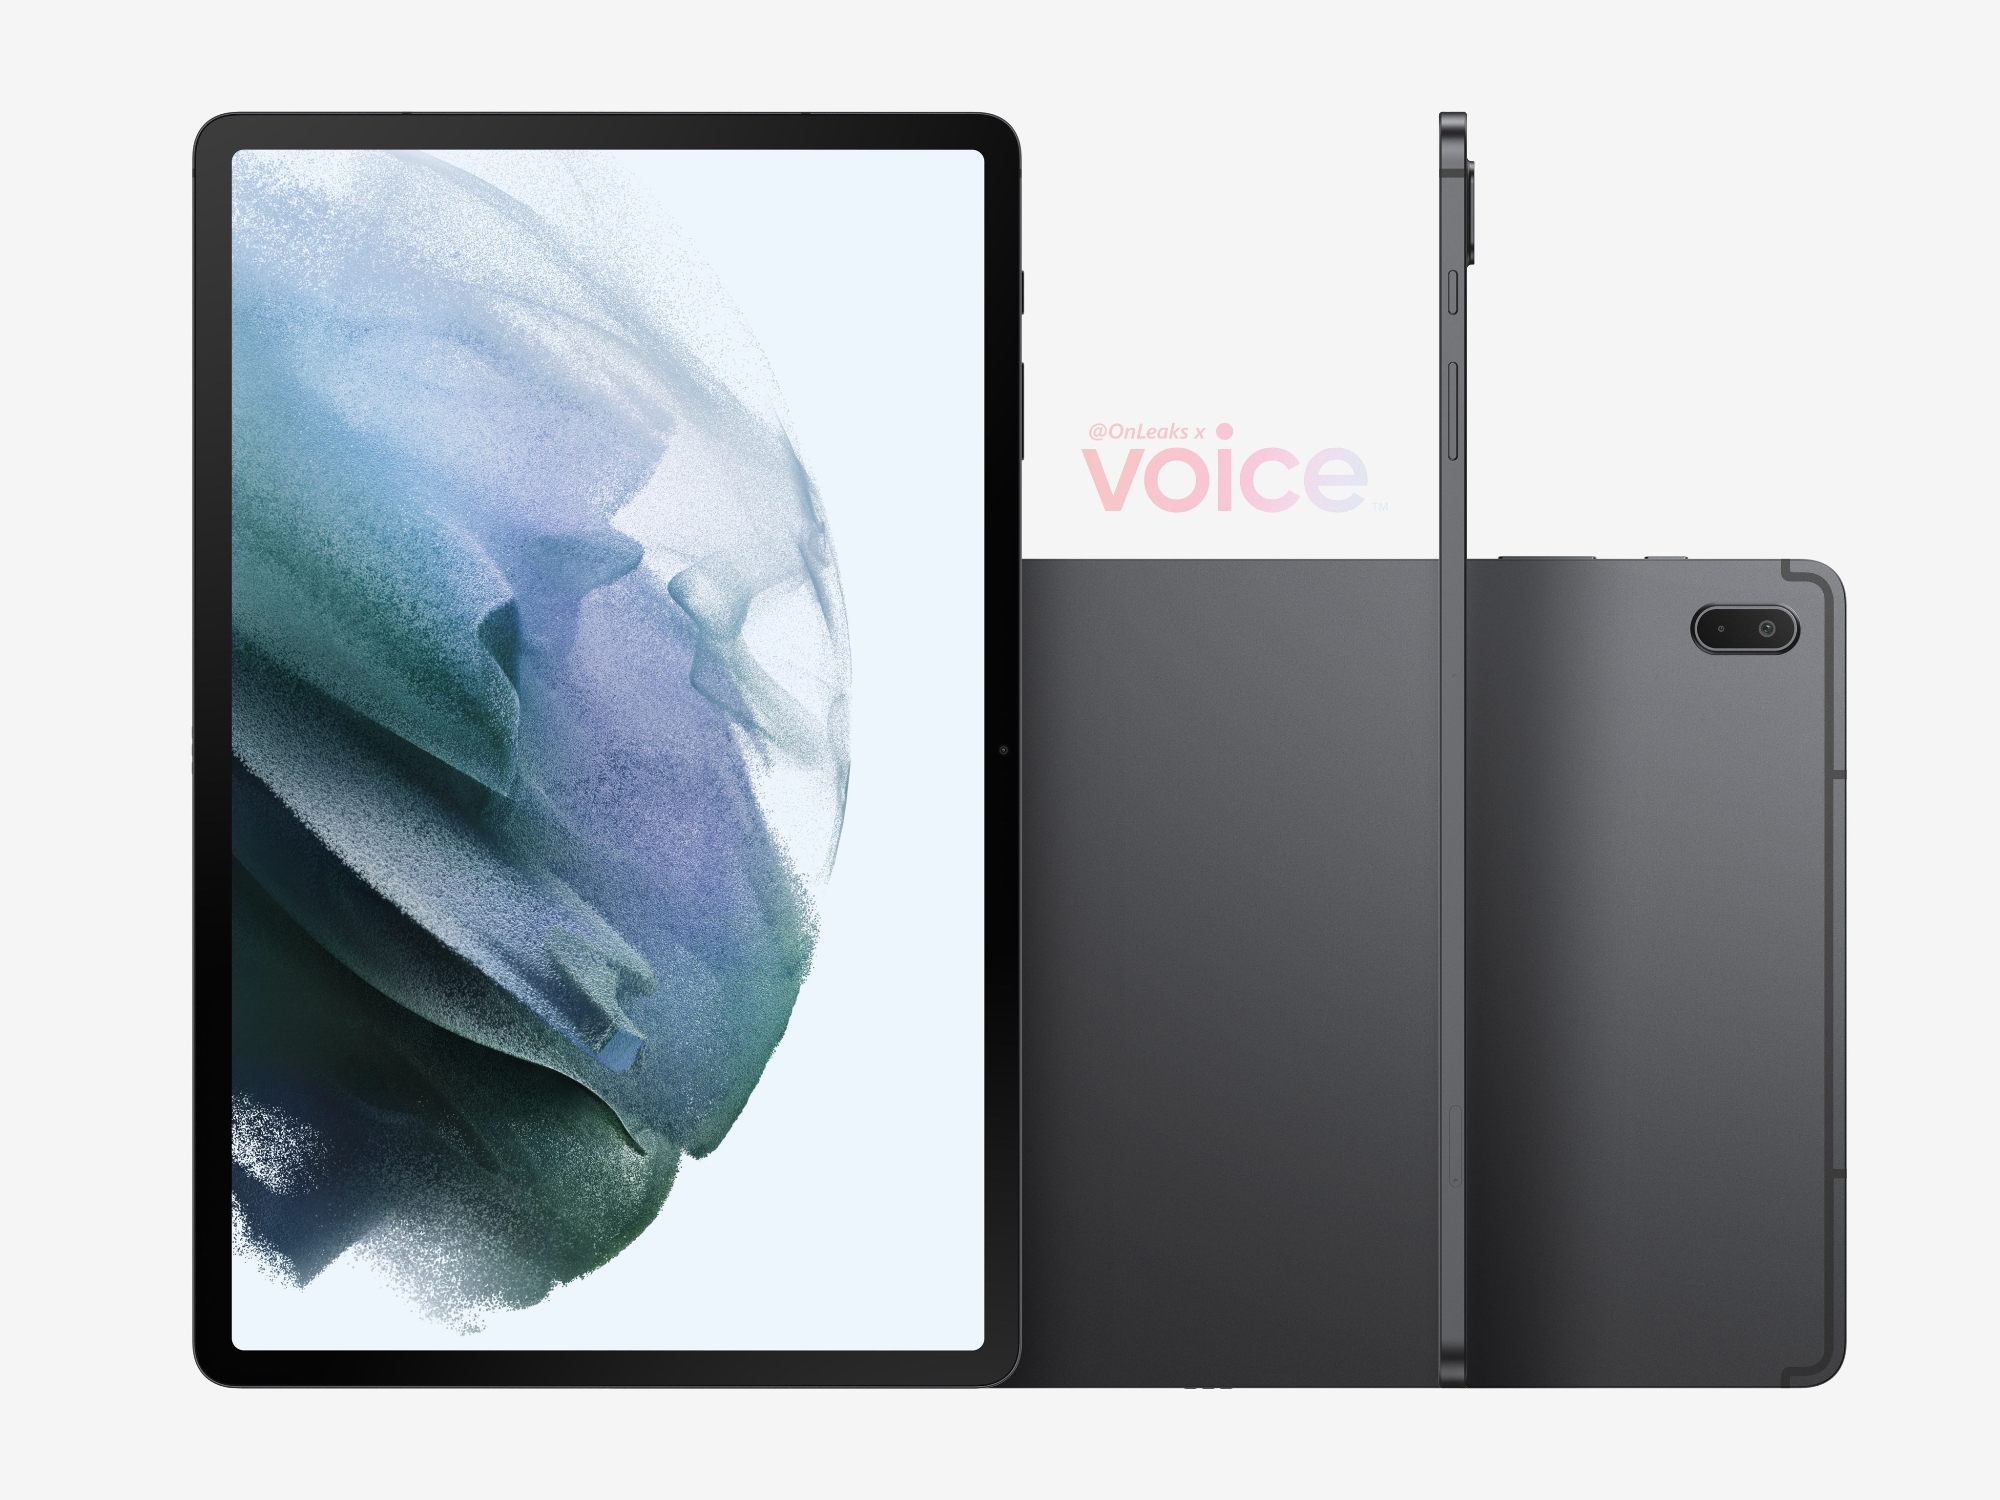 Samsung Galaxy Tab S7 Lite показался на видео: упрощённую версию Galaxy Tab S7 можно разглядеть со всех сторон